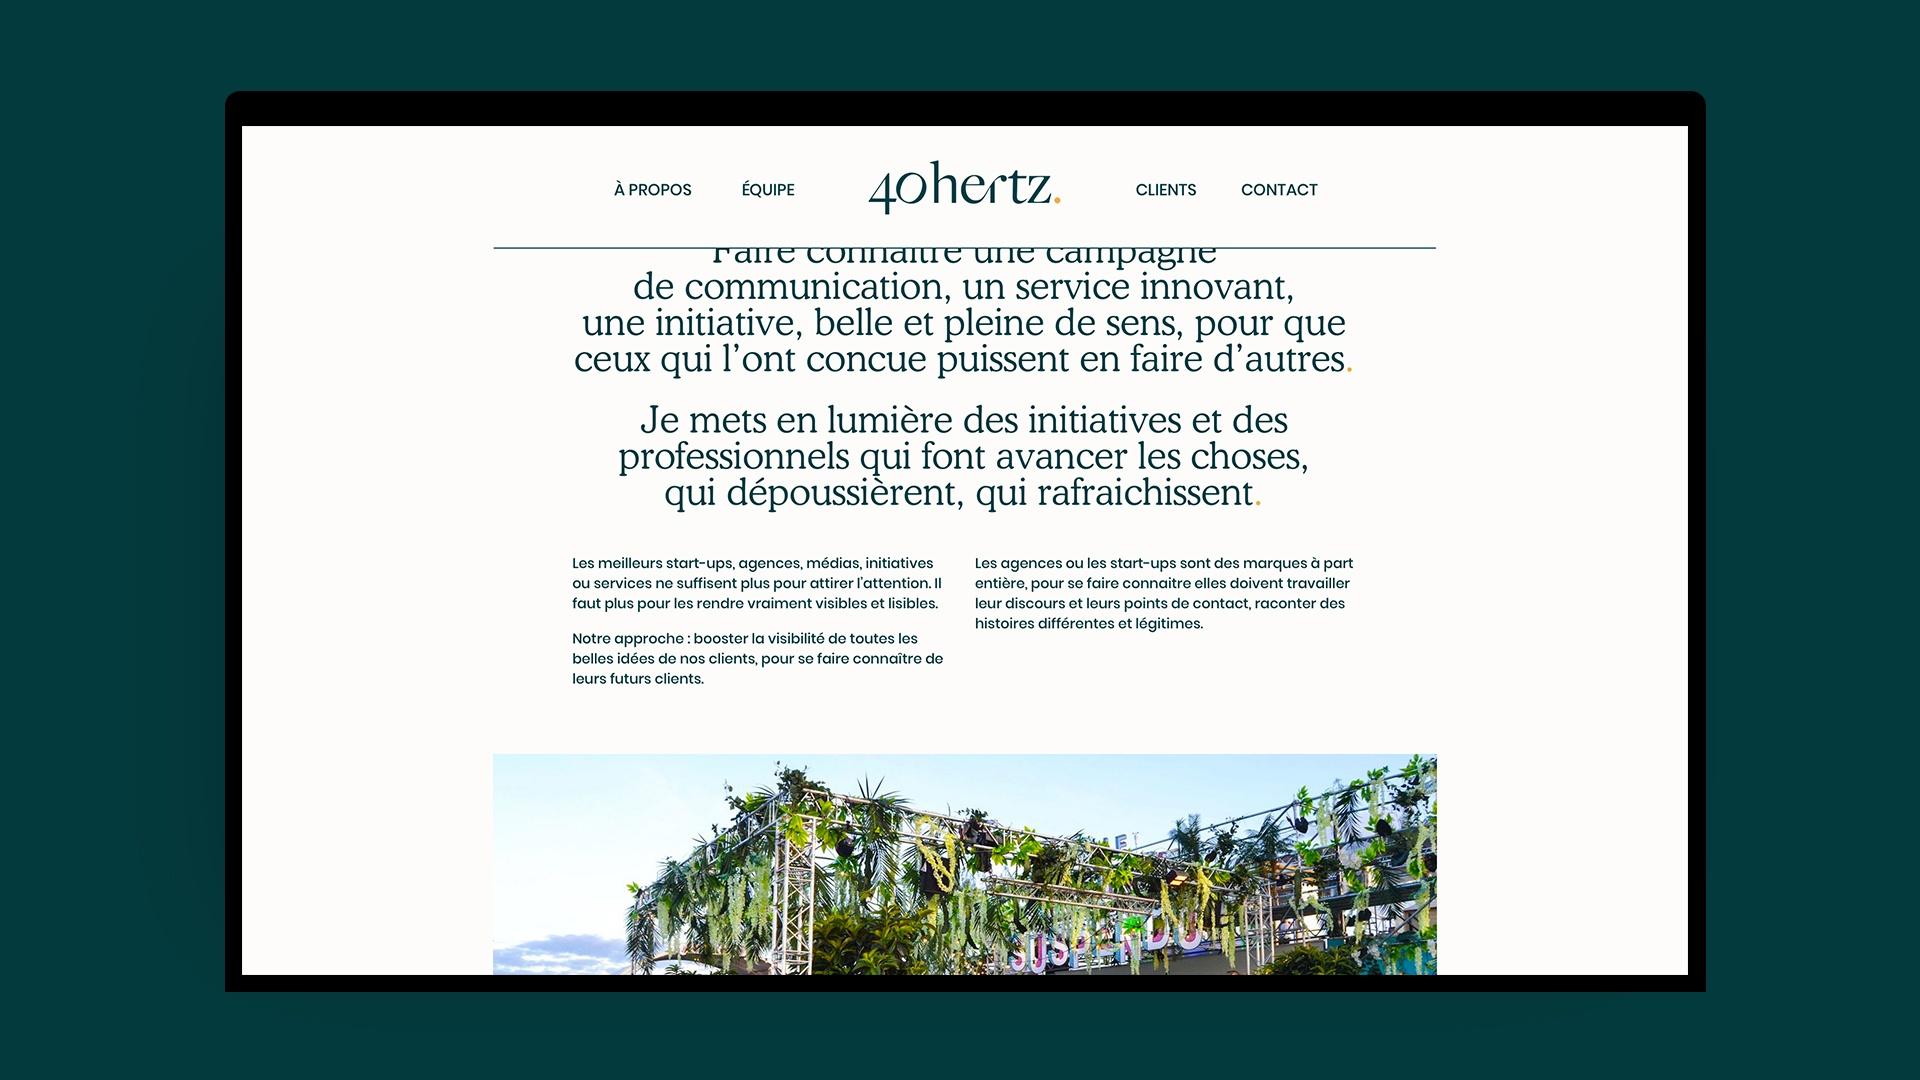 40-Hertz-Pauline-Germain-Relations-Presse-Antoine-Peltier-Designer-Graphique-2